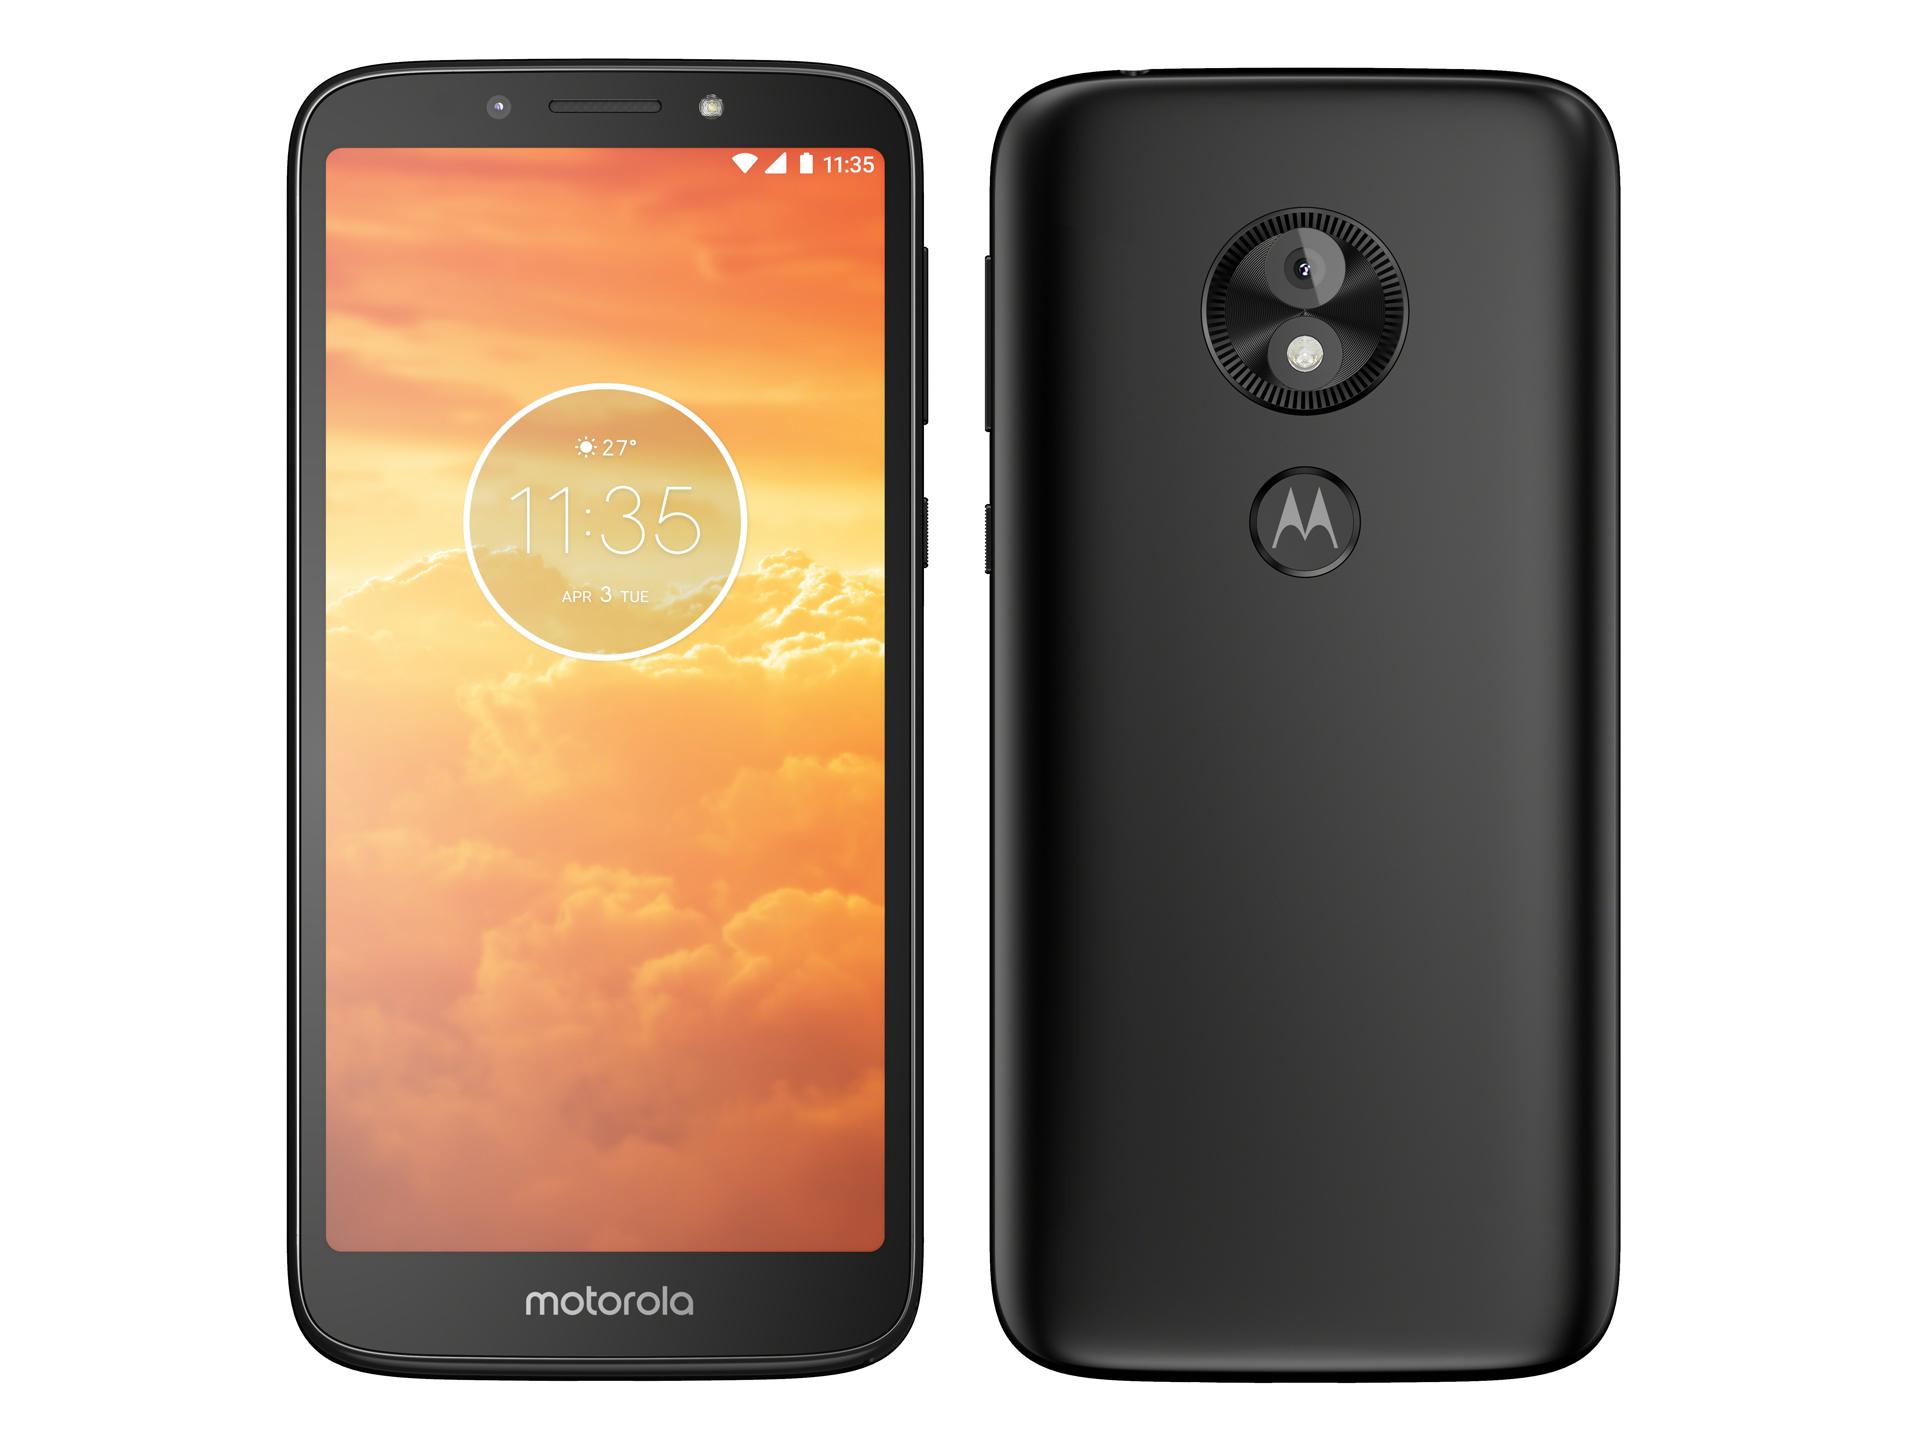 67bbaba4f Motorola Moto E5 Play Smartphone Review - NotebookCheck.net Reviews